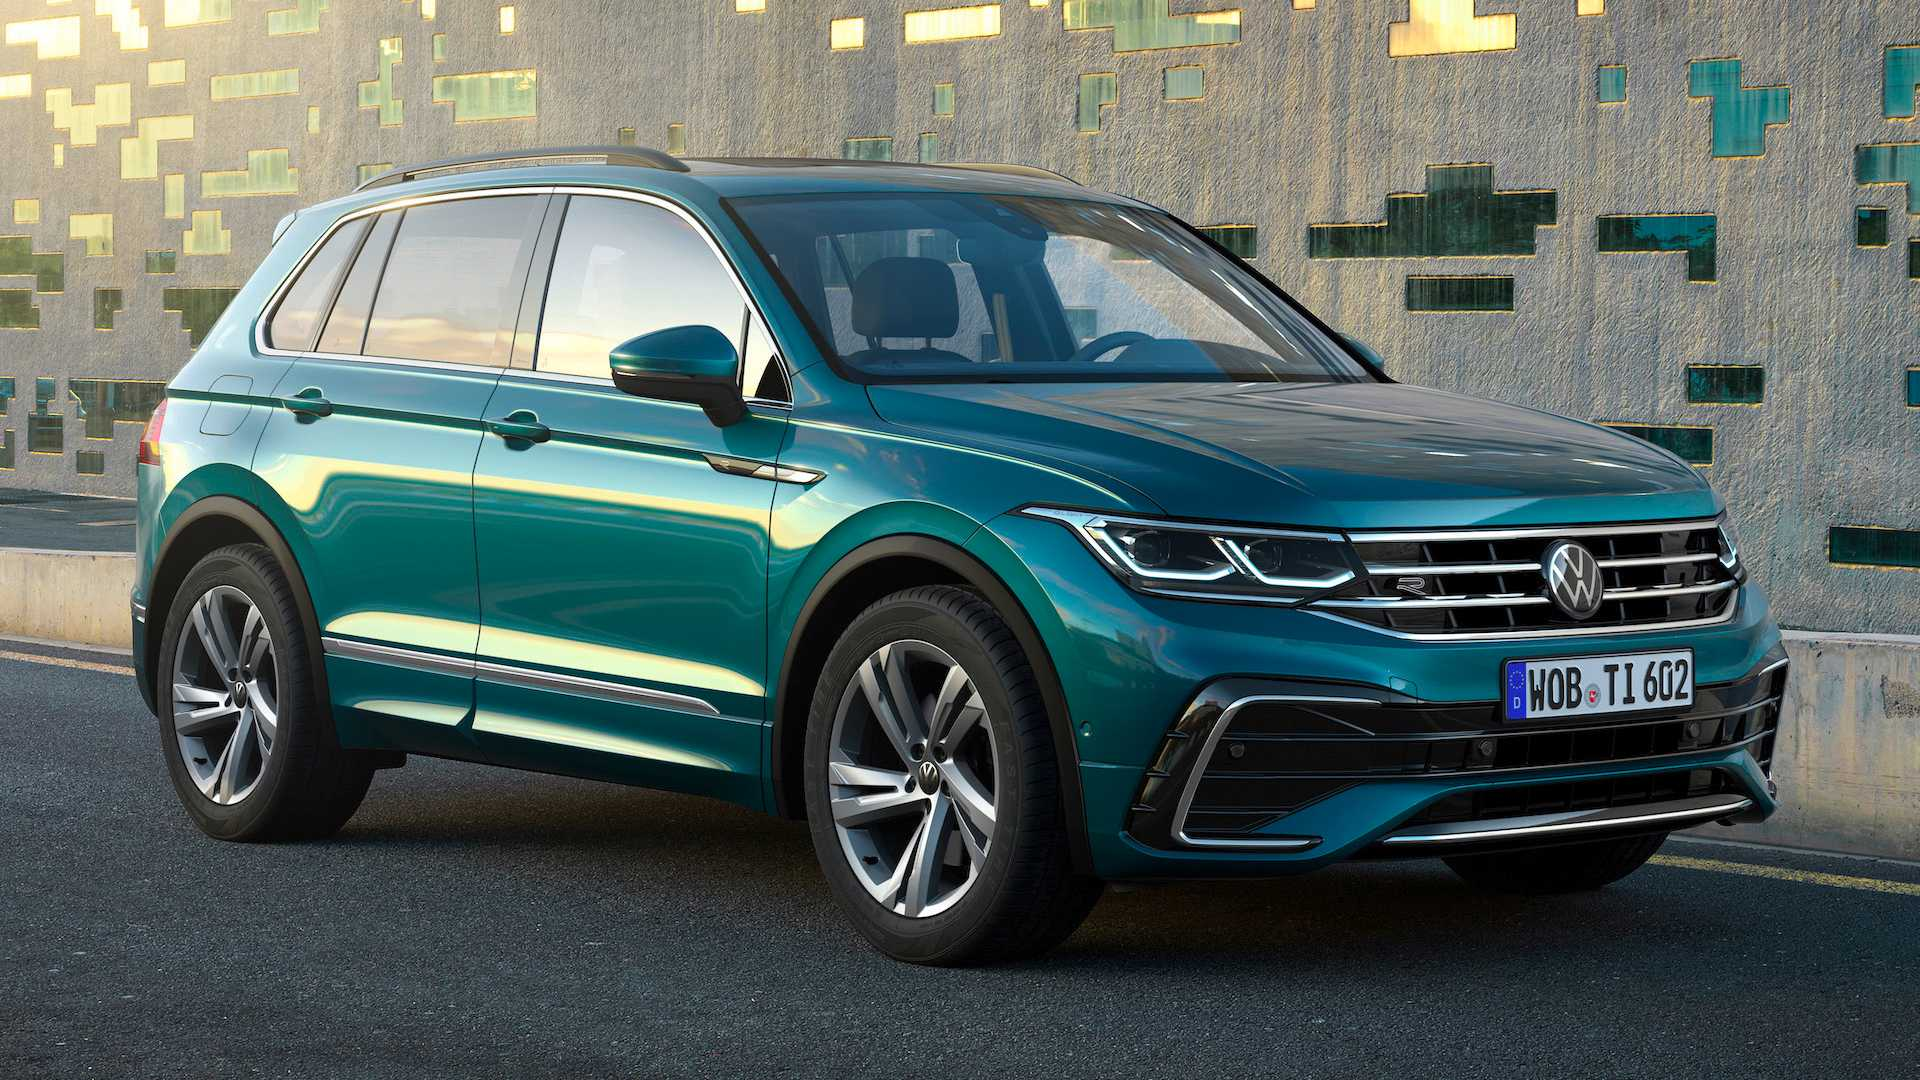 Novo Volkswagen Tiguan 2021 Falha No Teste Do Alce A 78 Km H